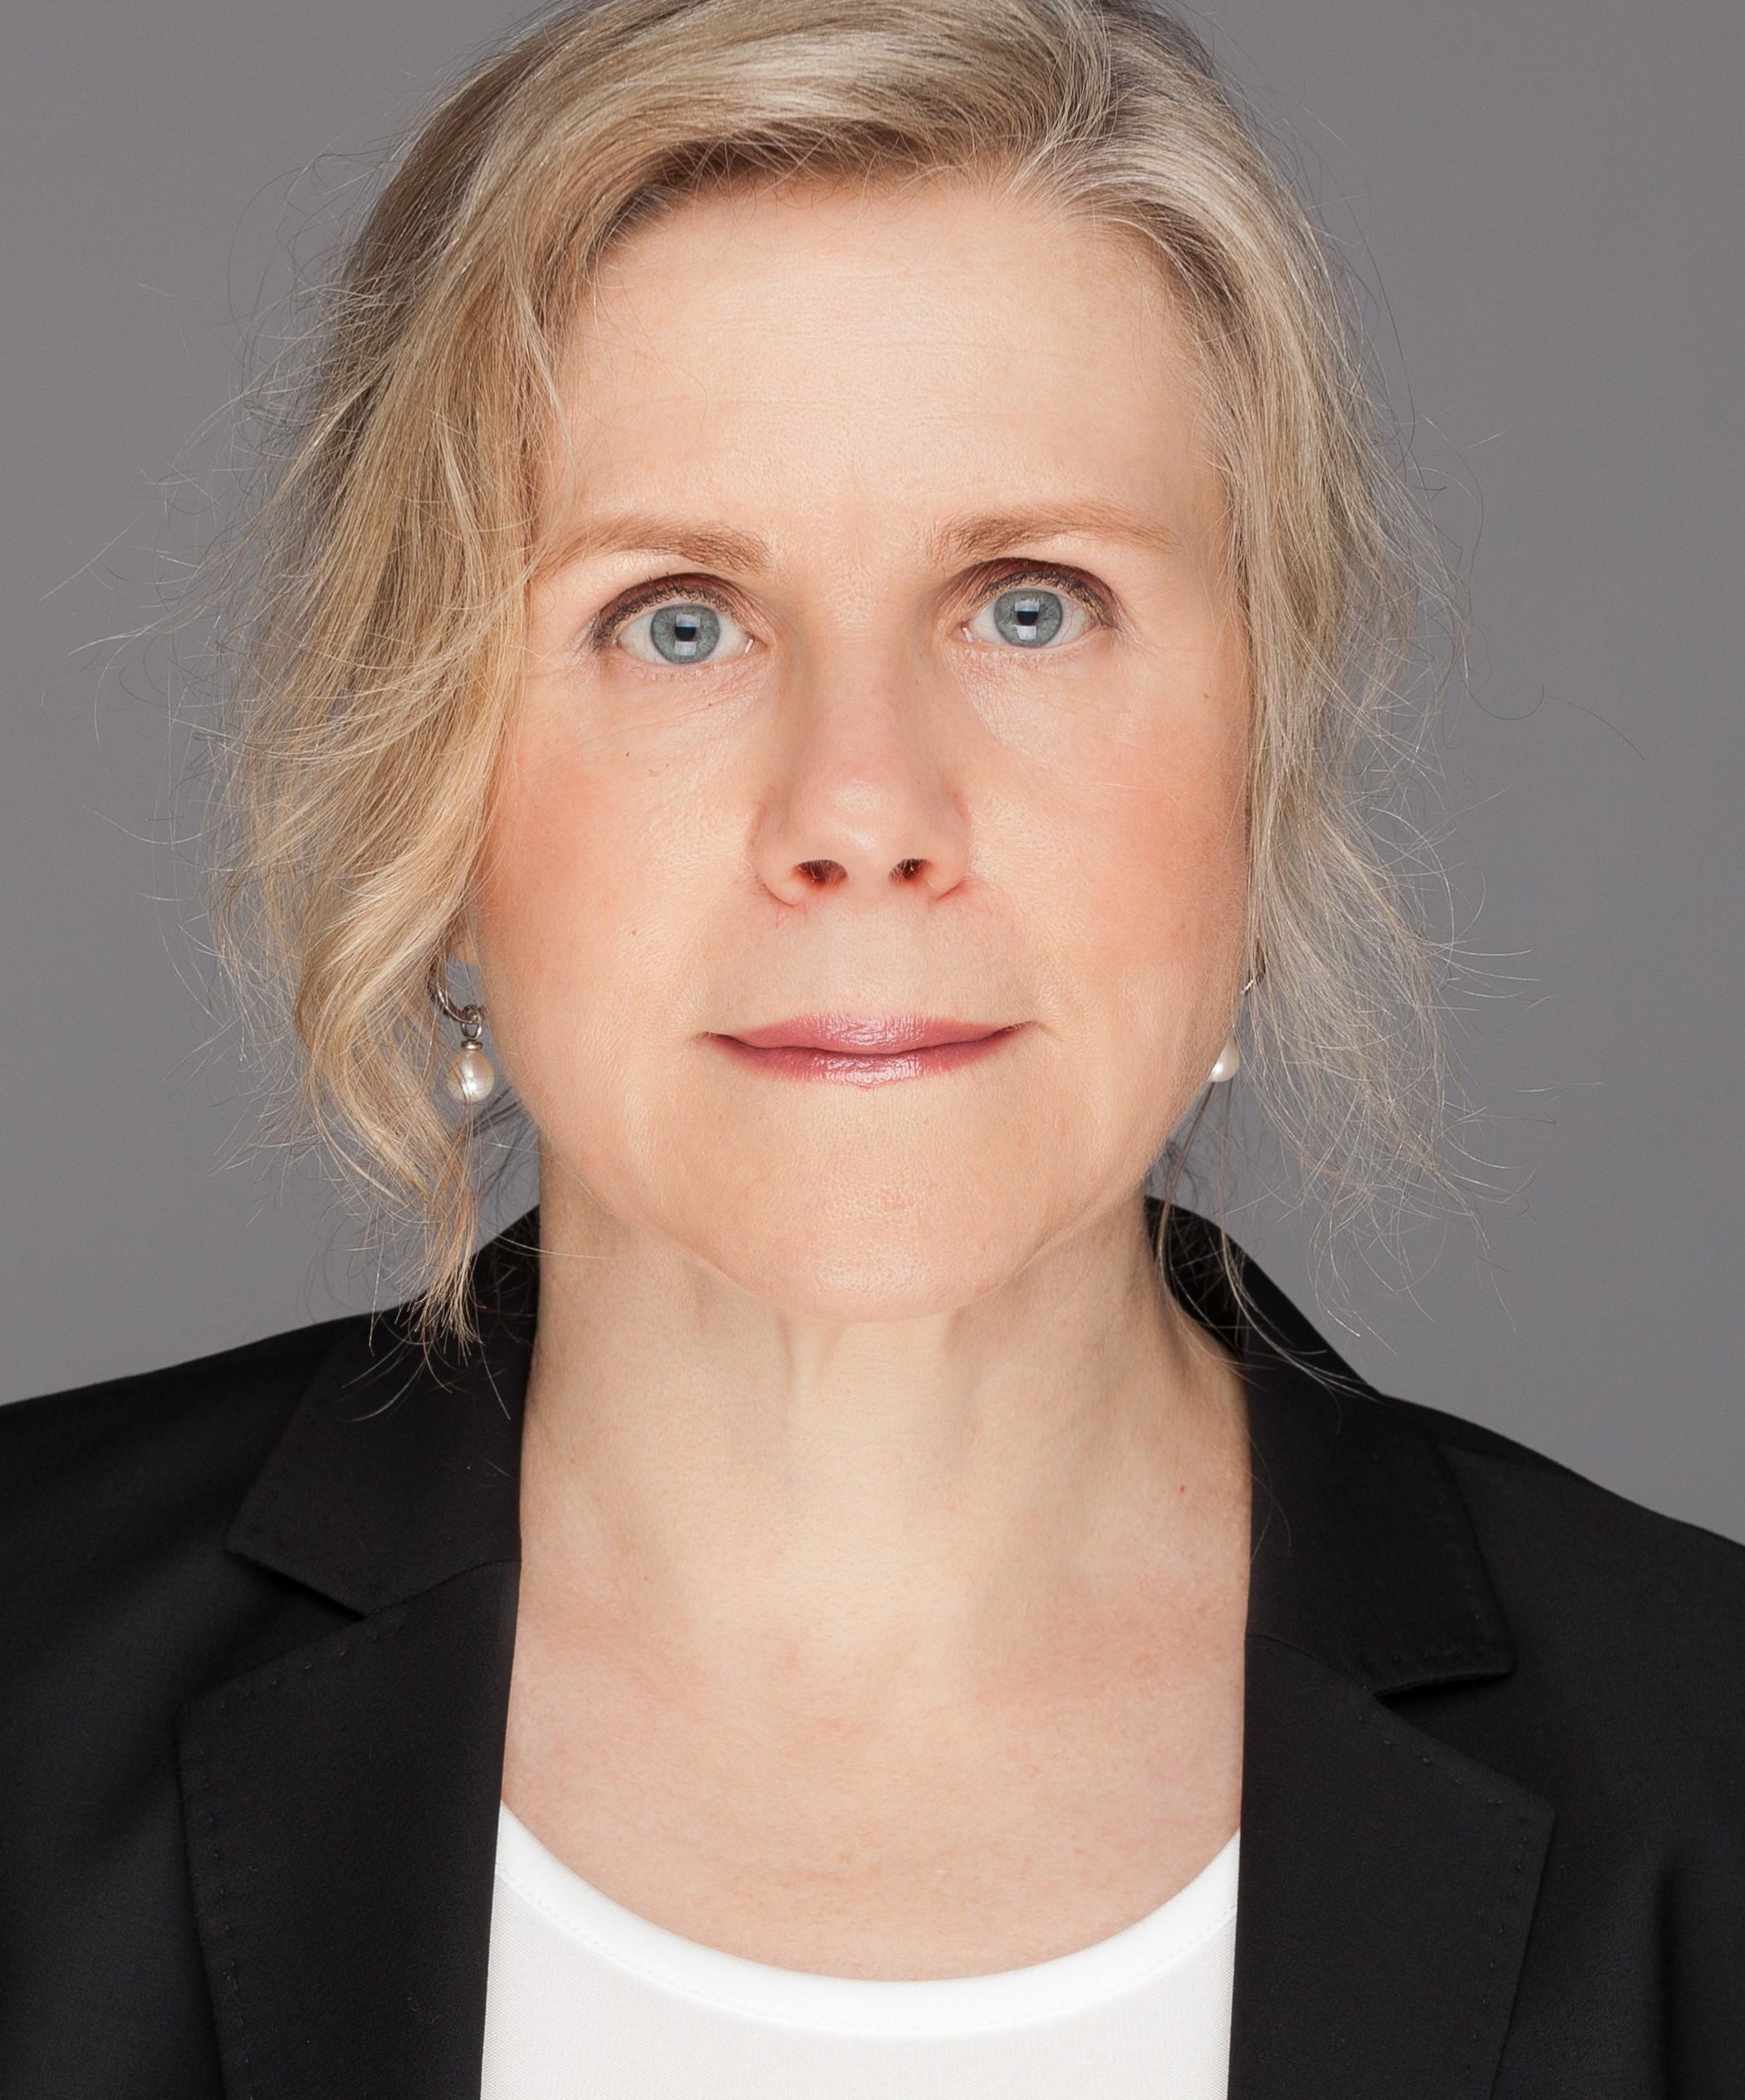 Lisa Ahlstrand